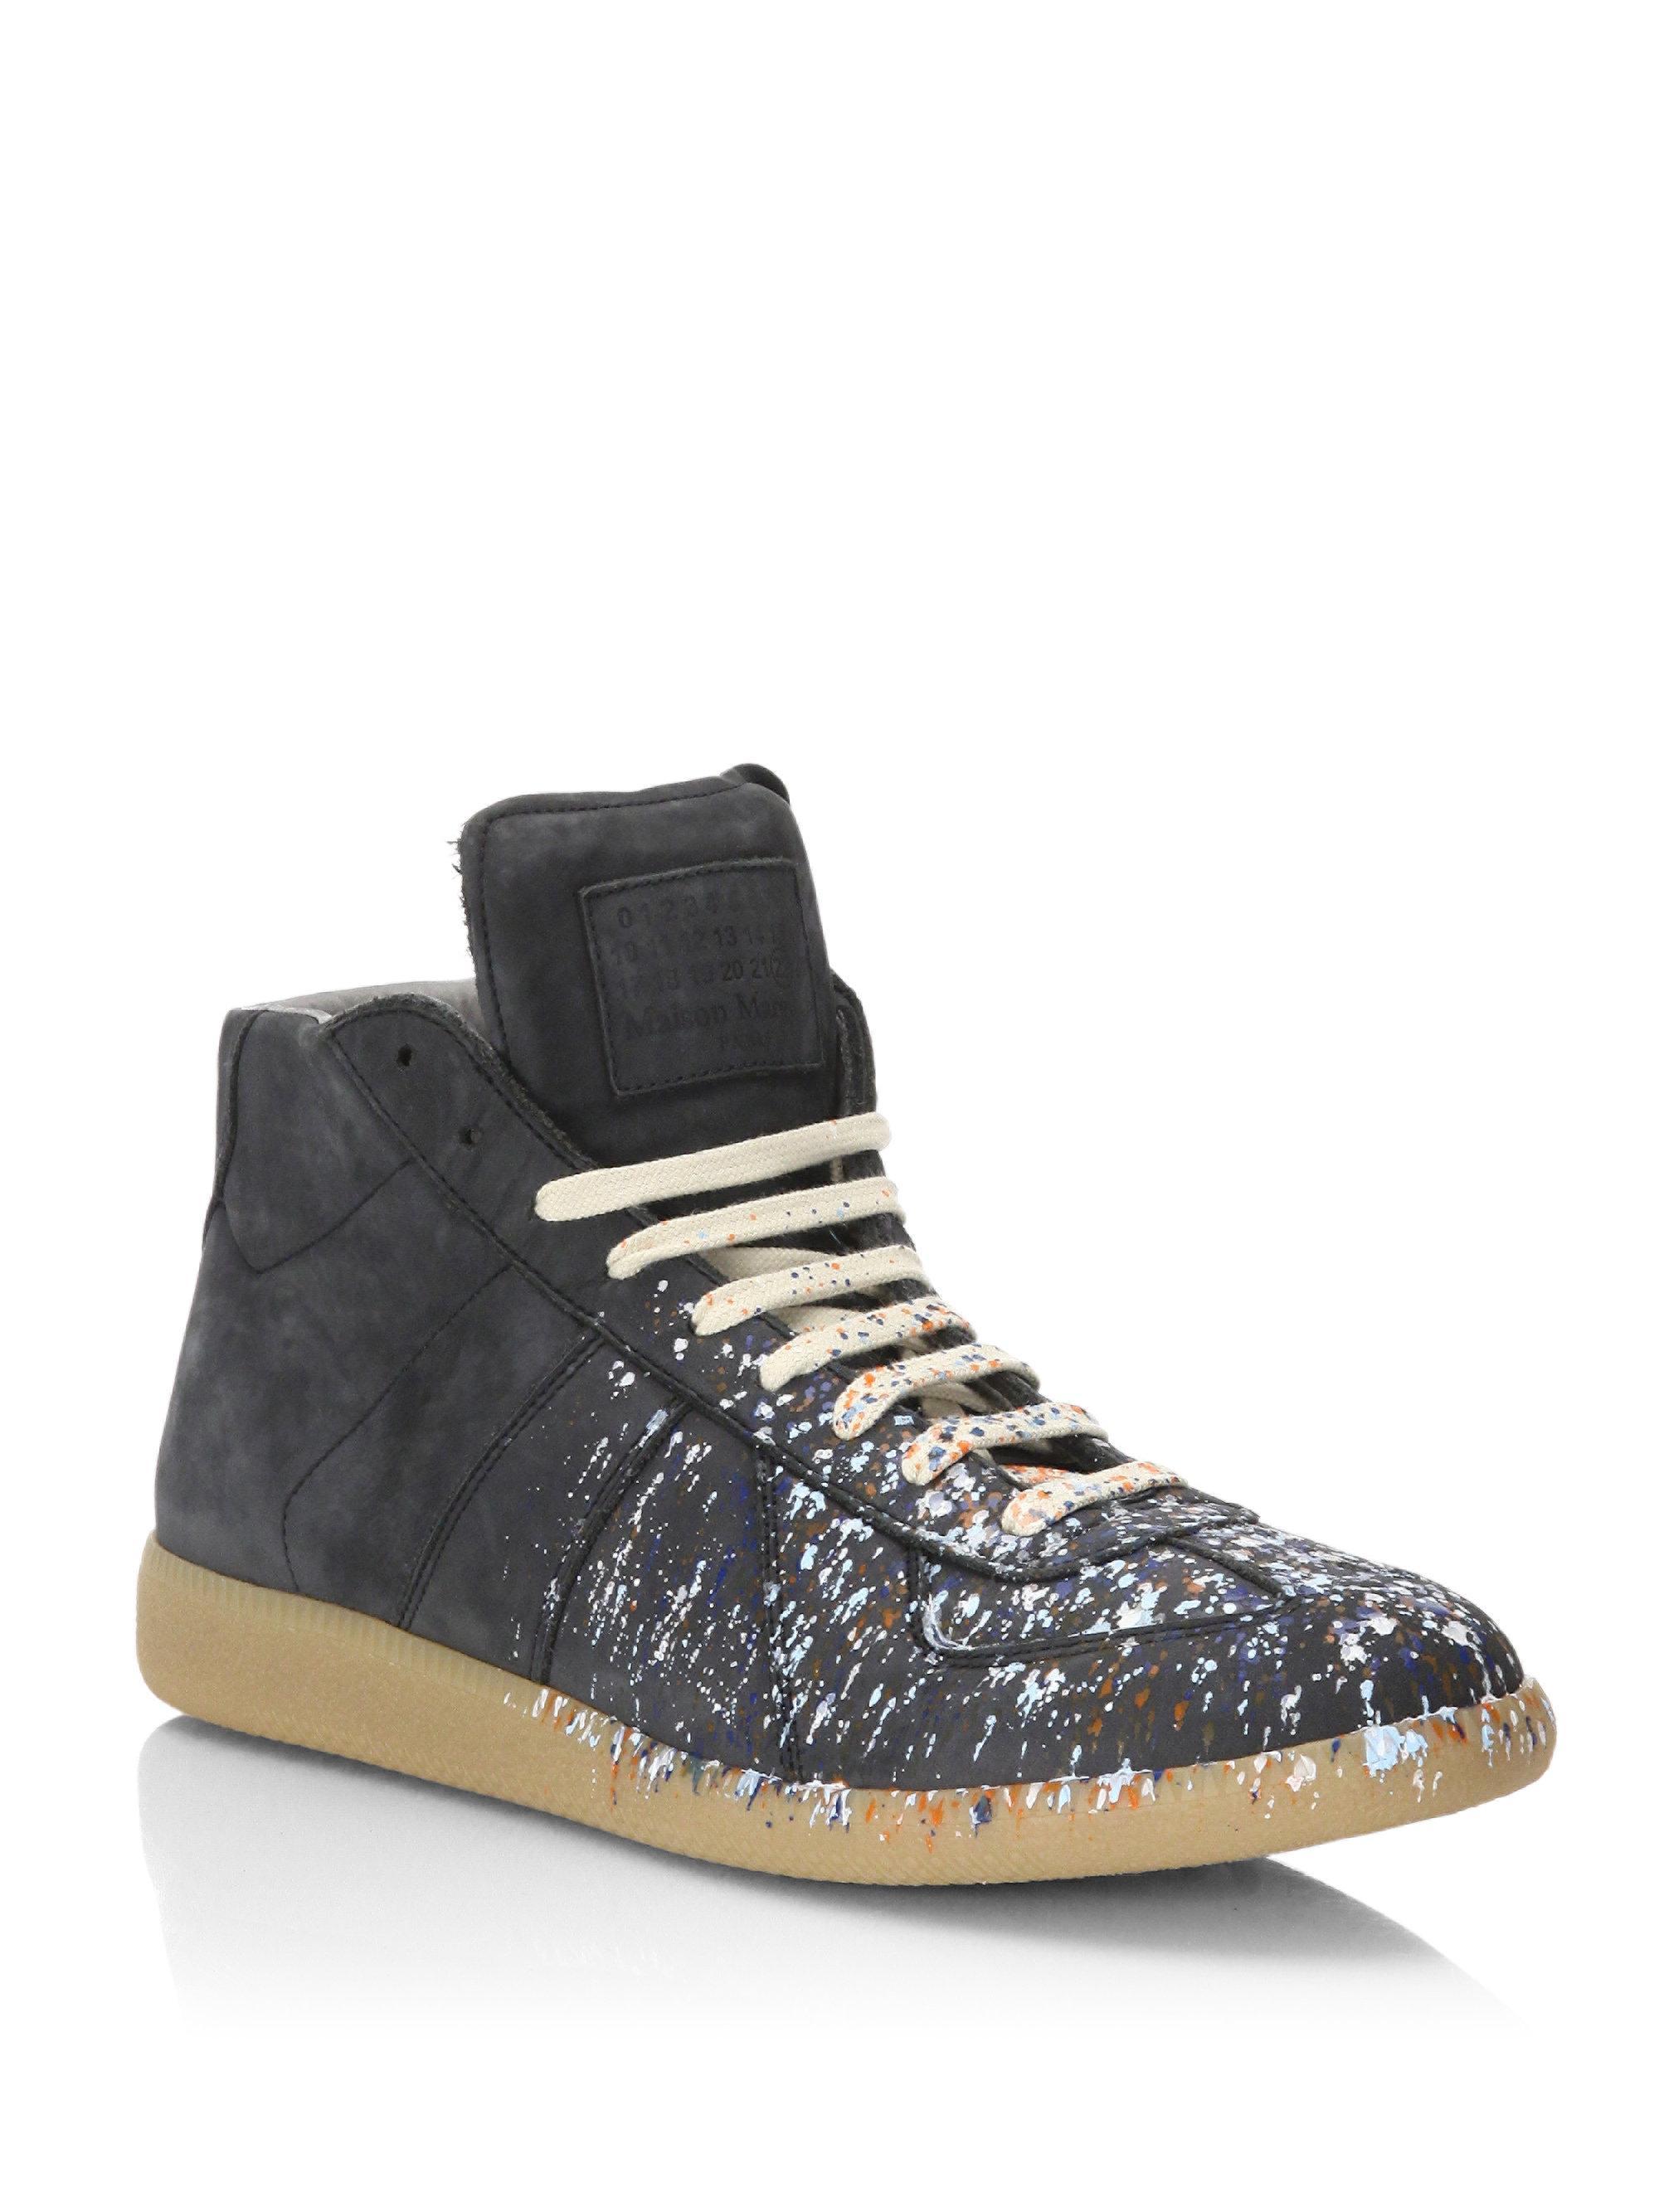 3ef703fce24 Maison Margiela Black Replica Paint Splatter Suede Mid-top Sneakers for men